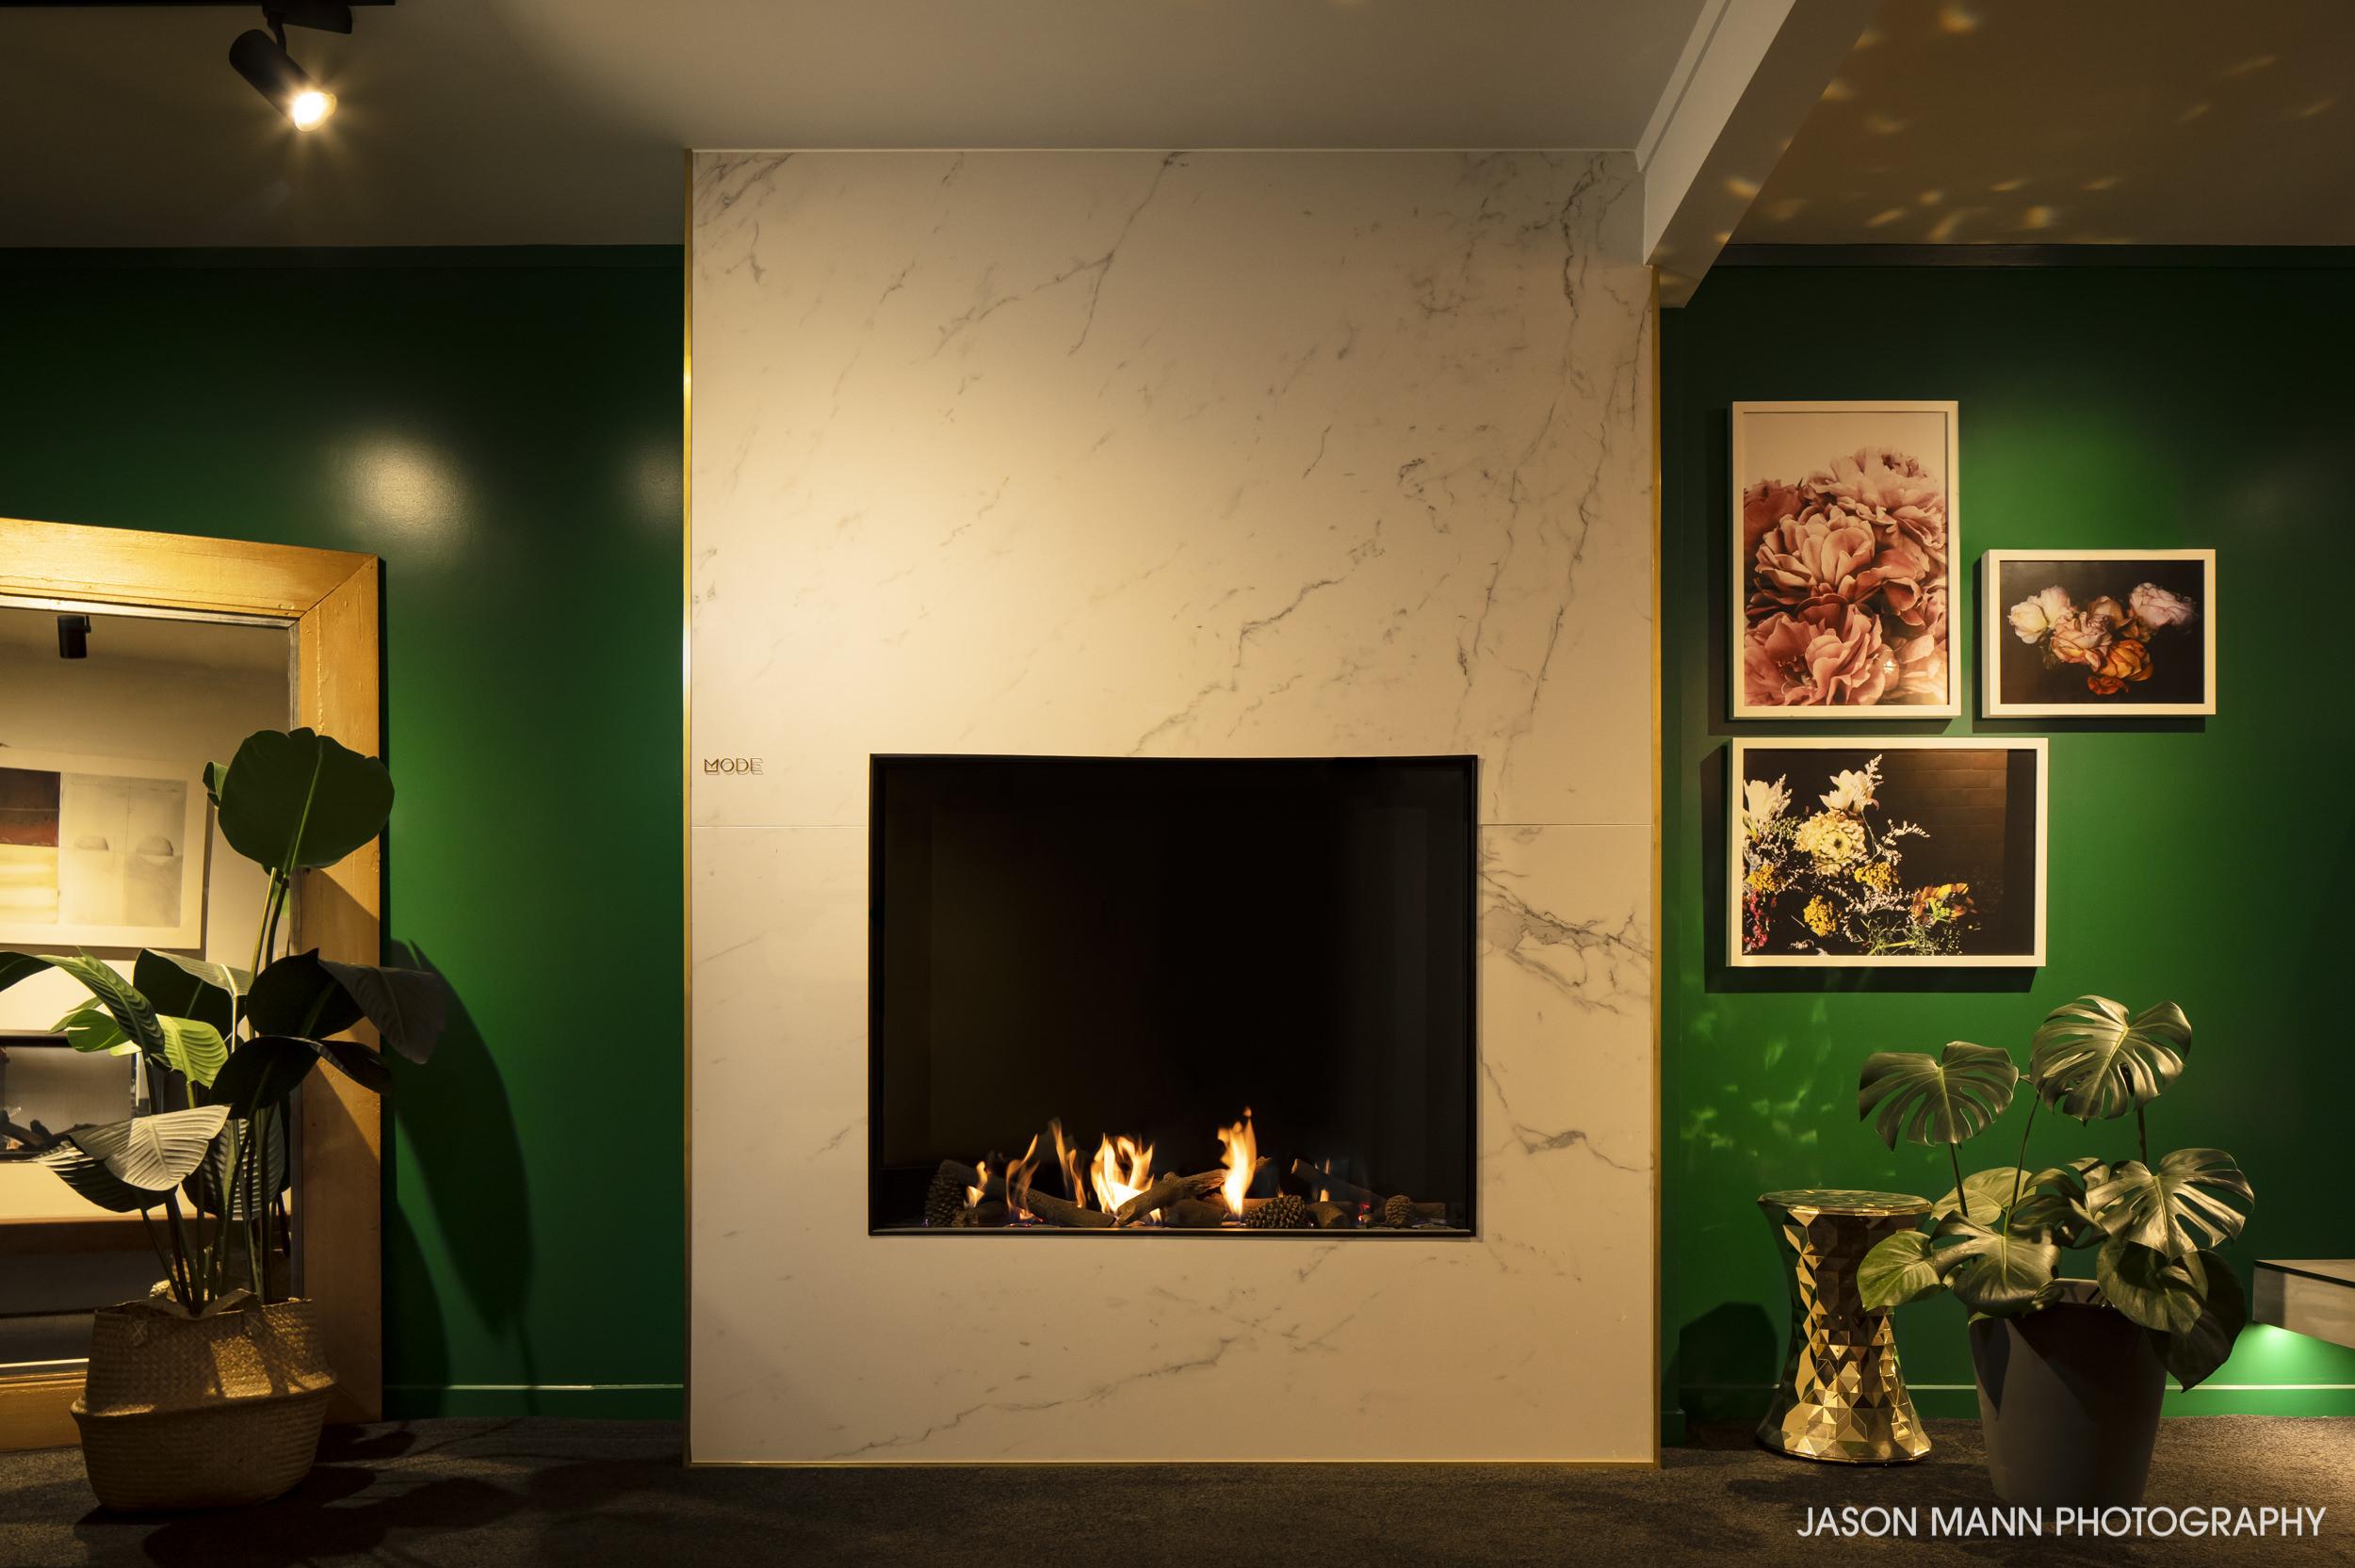 Jason_Mann_Fireplaces_01.jpg